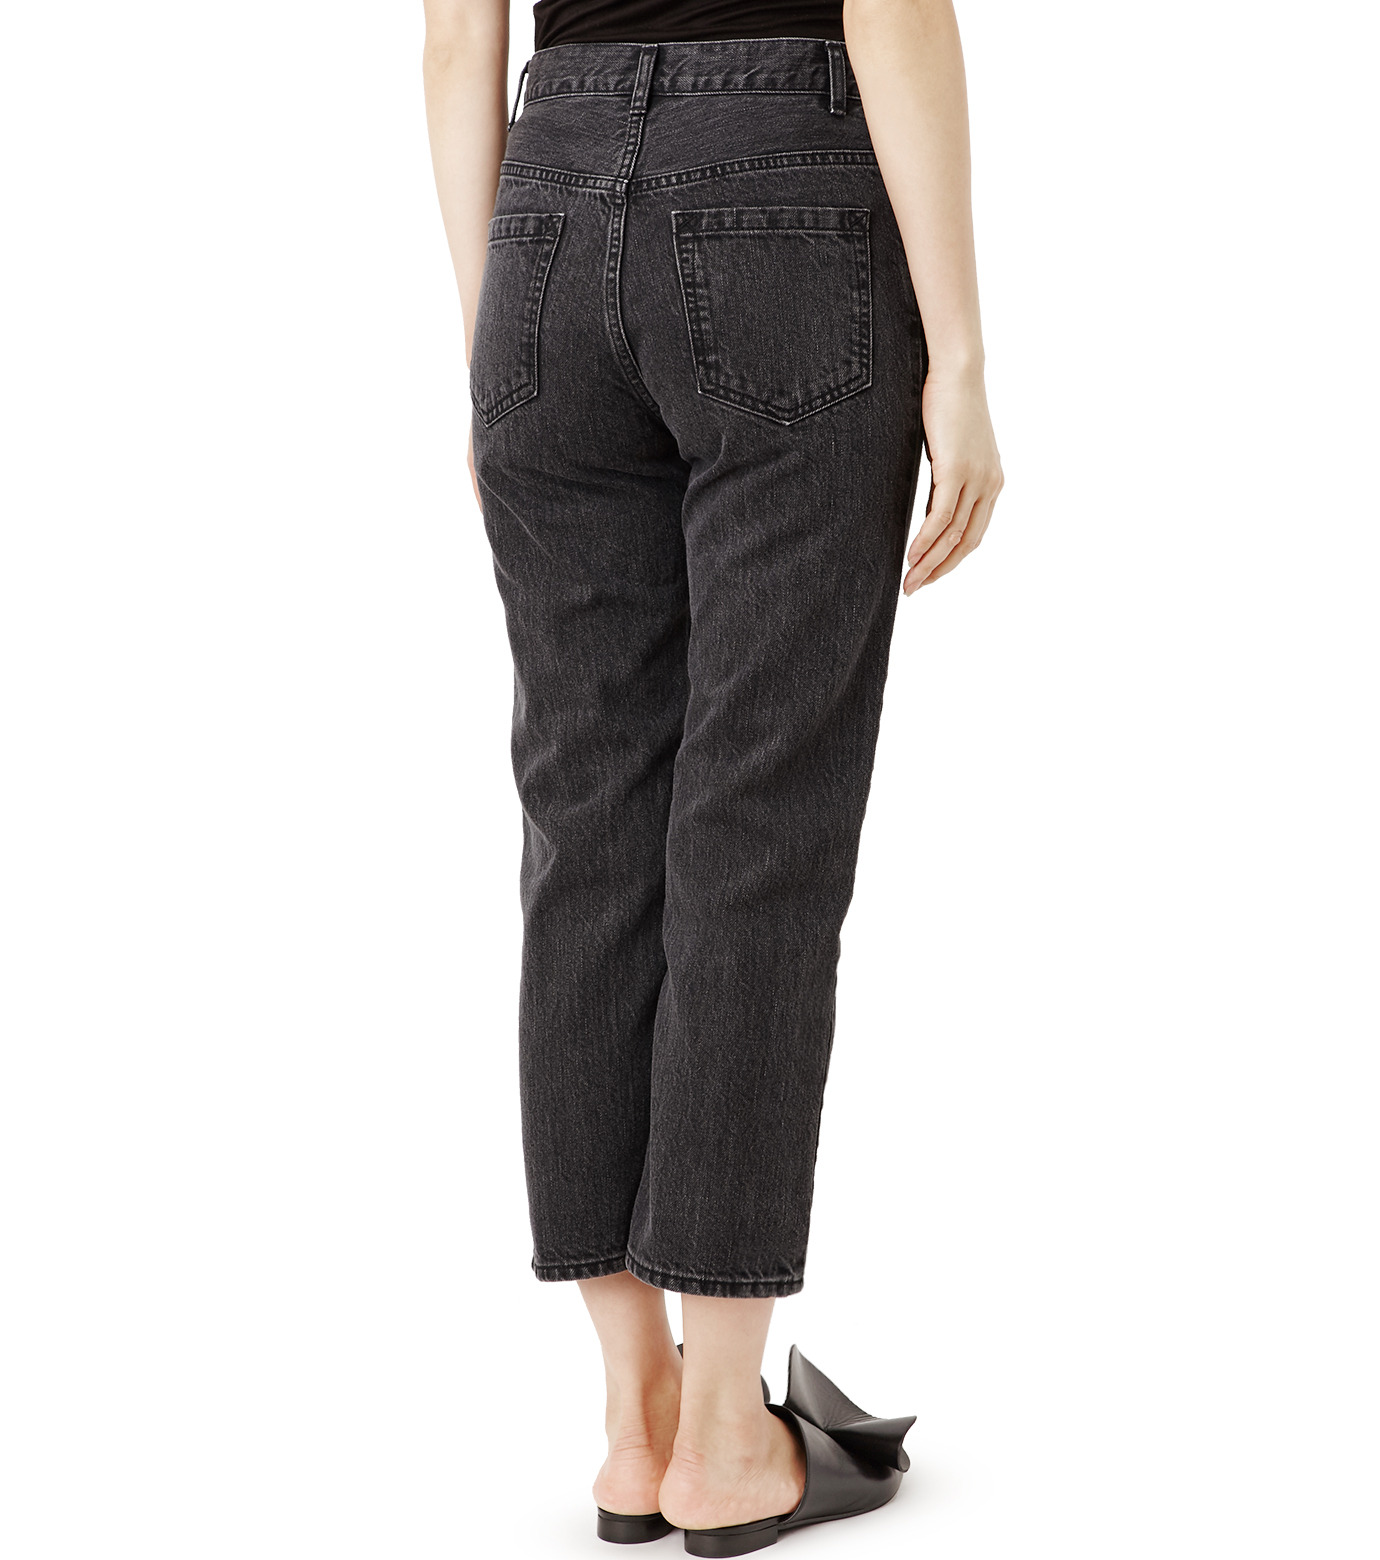 LE CIEL BLEU(ルシェルブルー)のセンタープレスデニムパンツ-BLACK(パンツ/pants)-18A68515 拡大詳細画像2